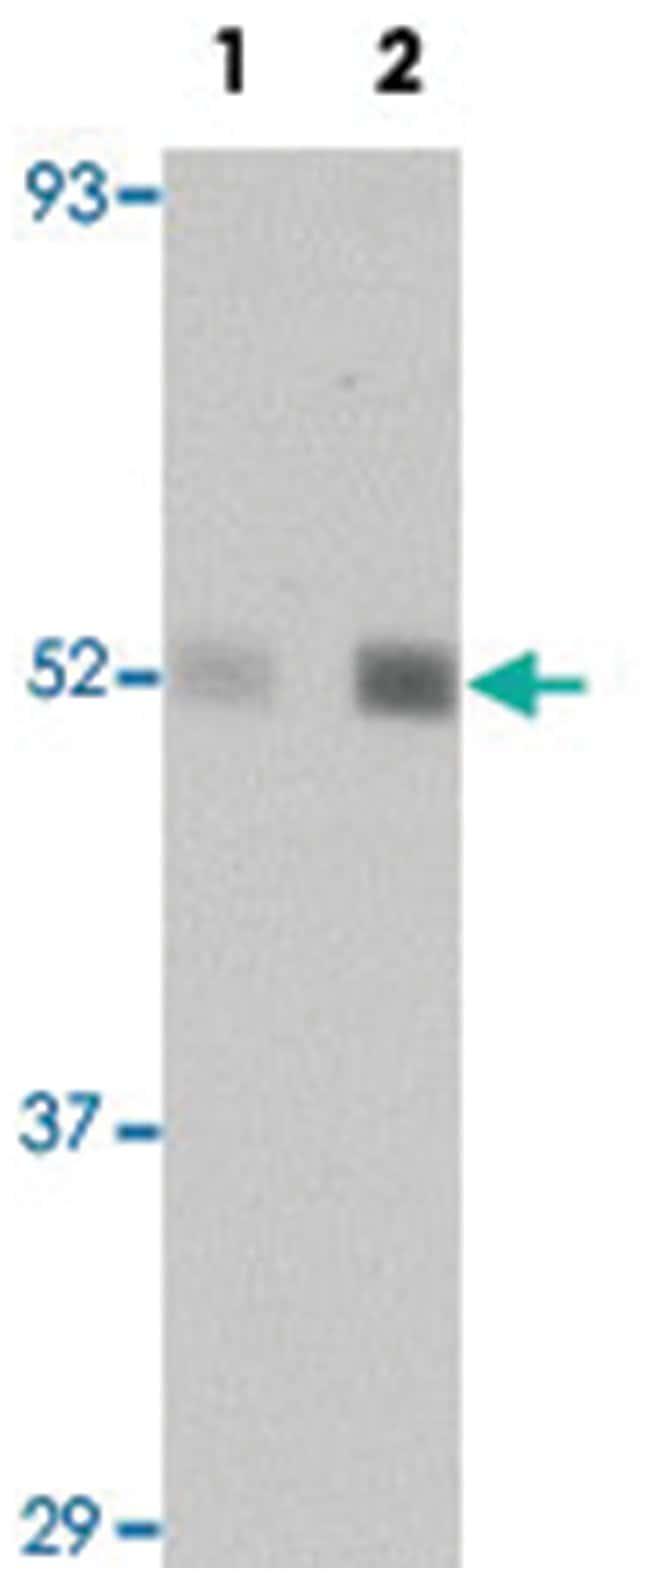 NR1H2 Rabbit anti-Human, Mouse, Rat, Polyclonal Antibody, Abnova 100µg;